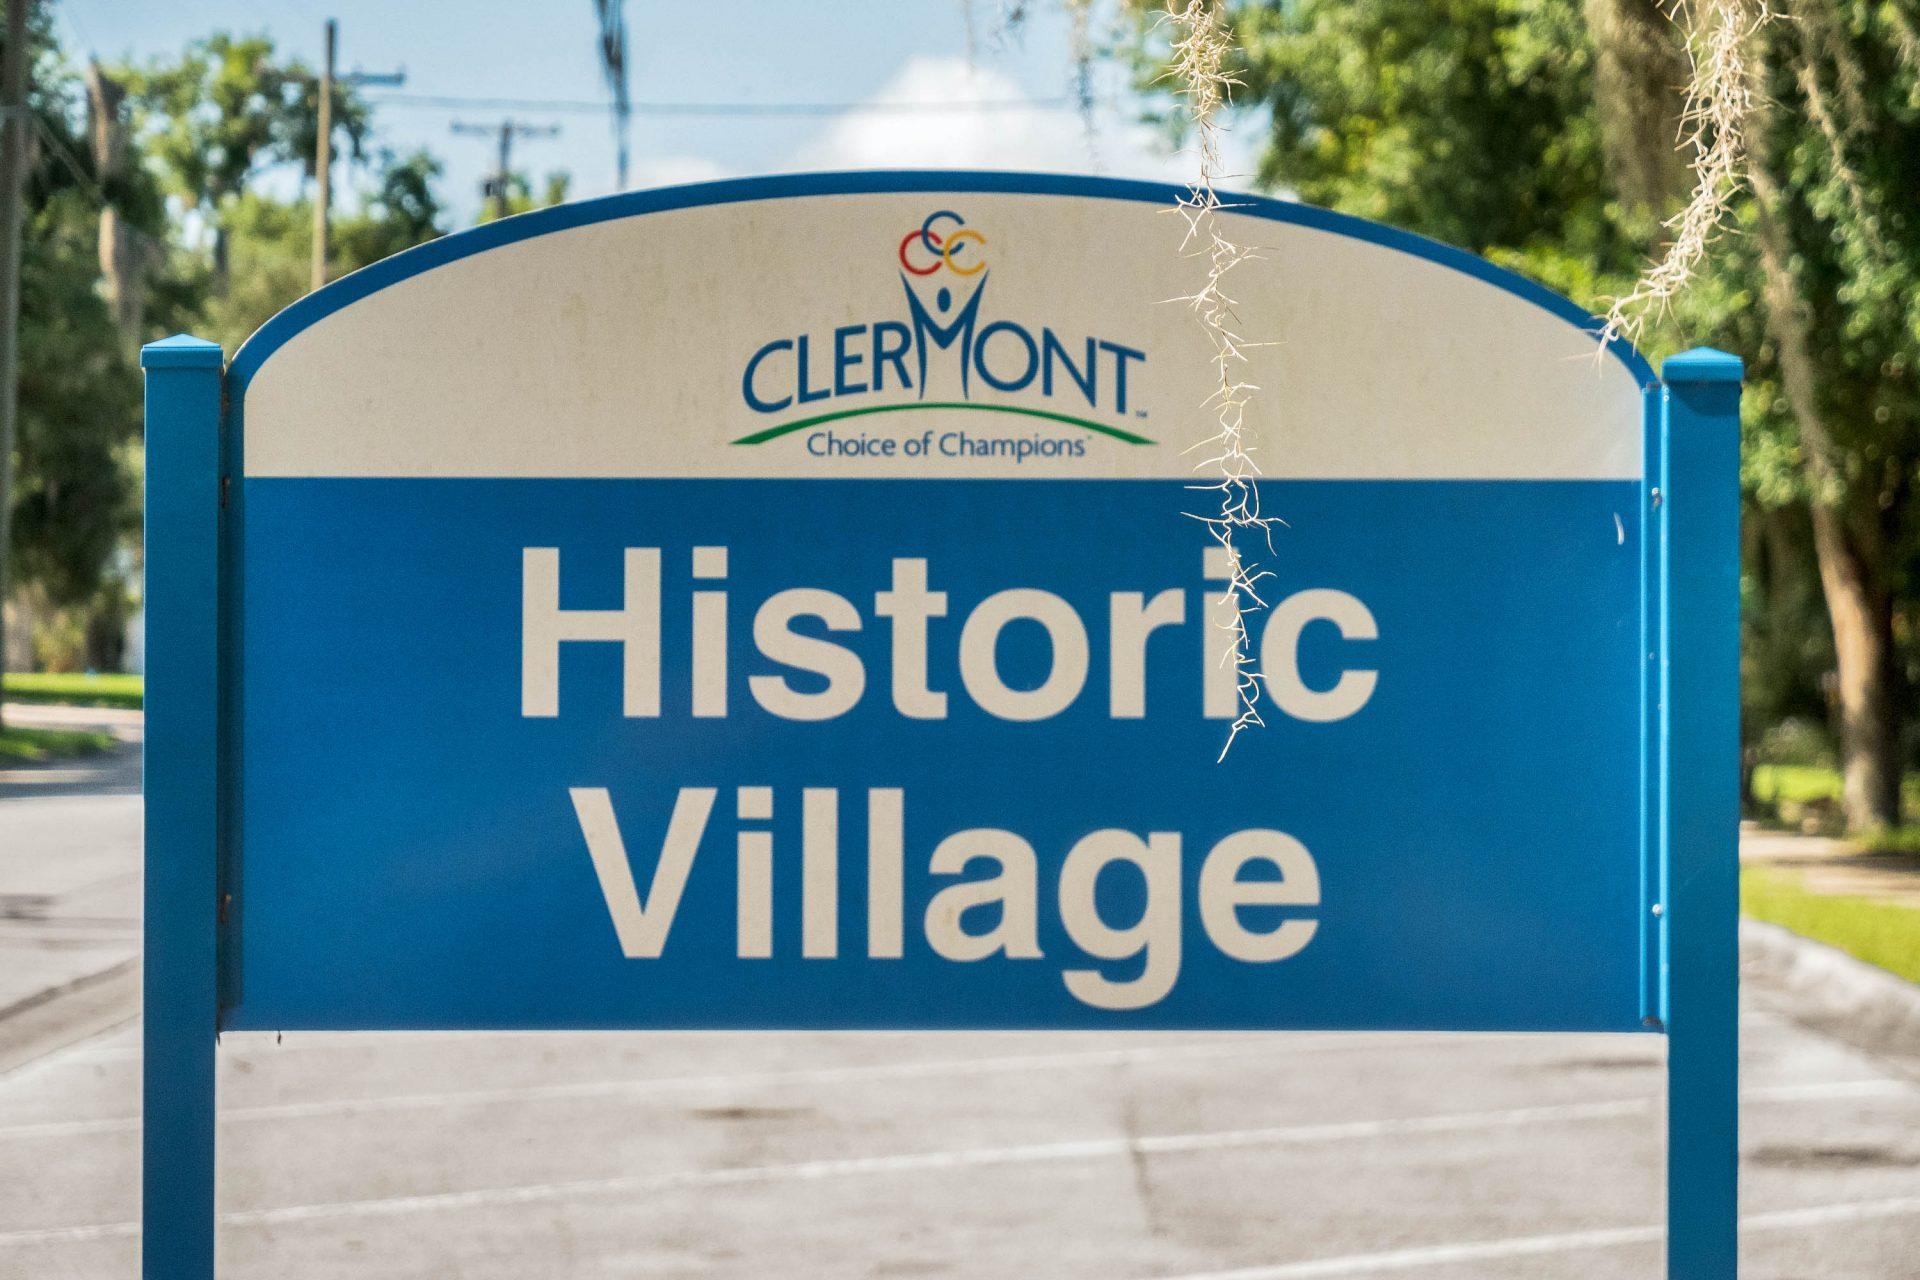 Historic Village of Clermont Florida